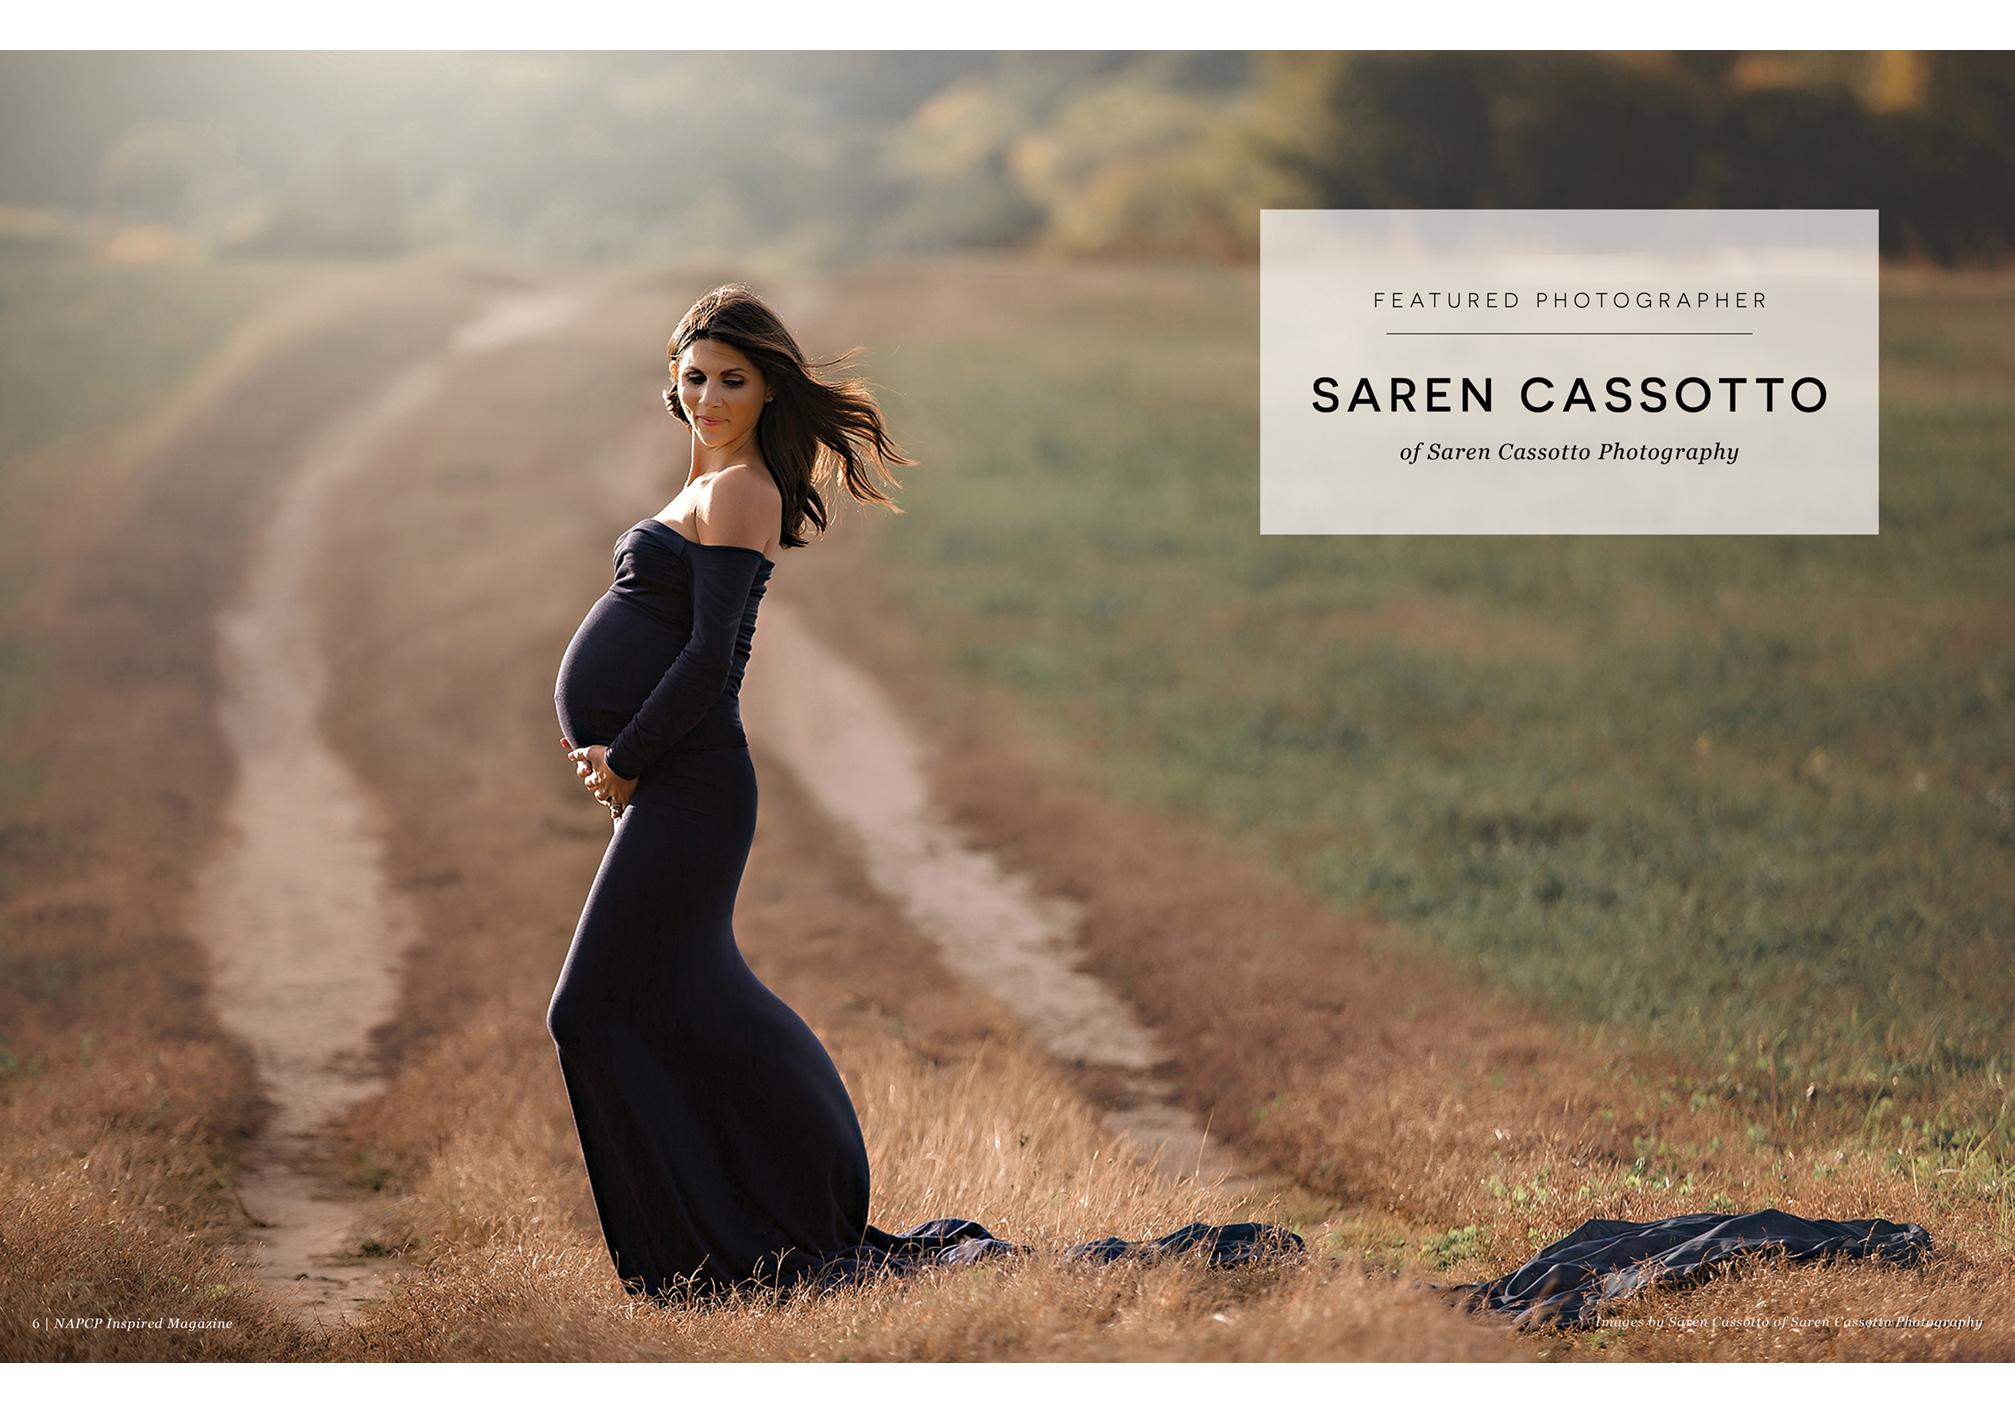 Featured Photographer Saren Cassotto, Saren Cassotto Photography